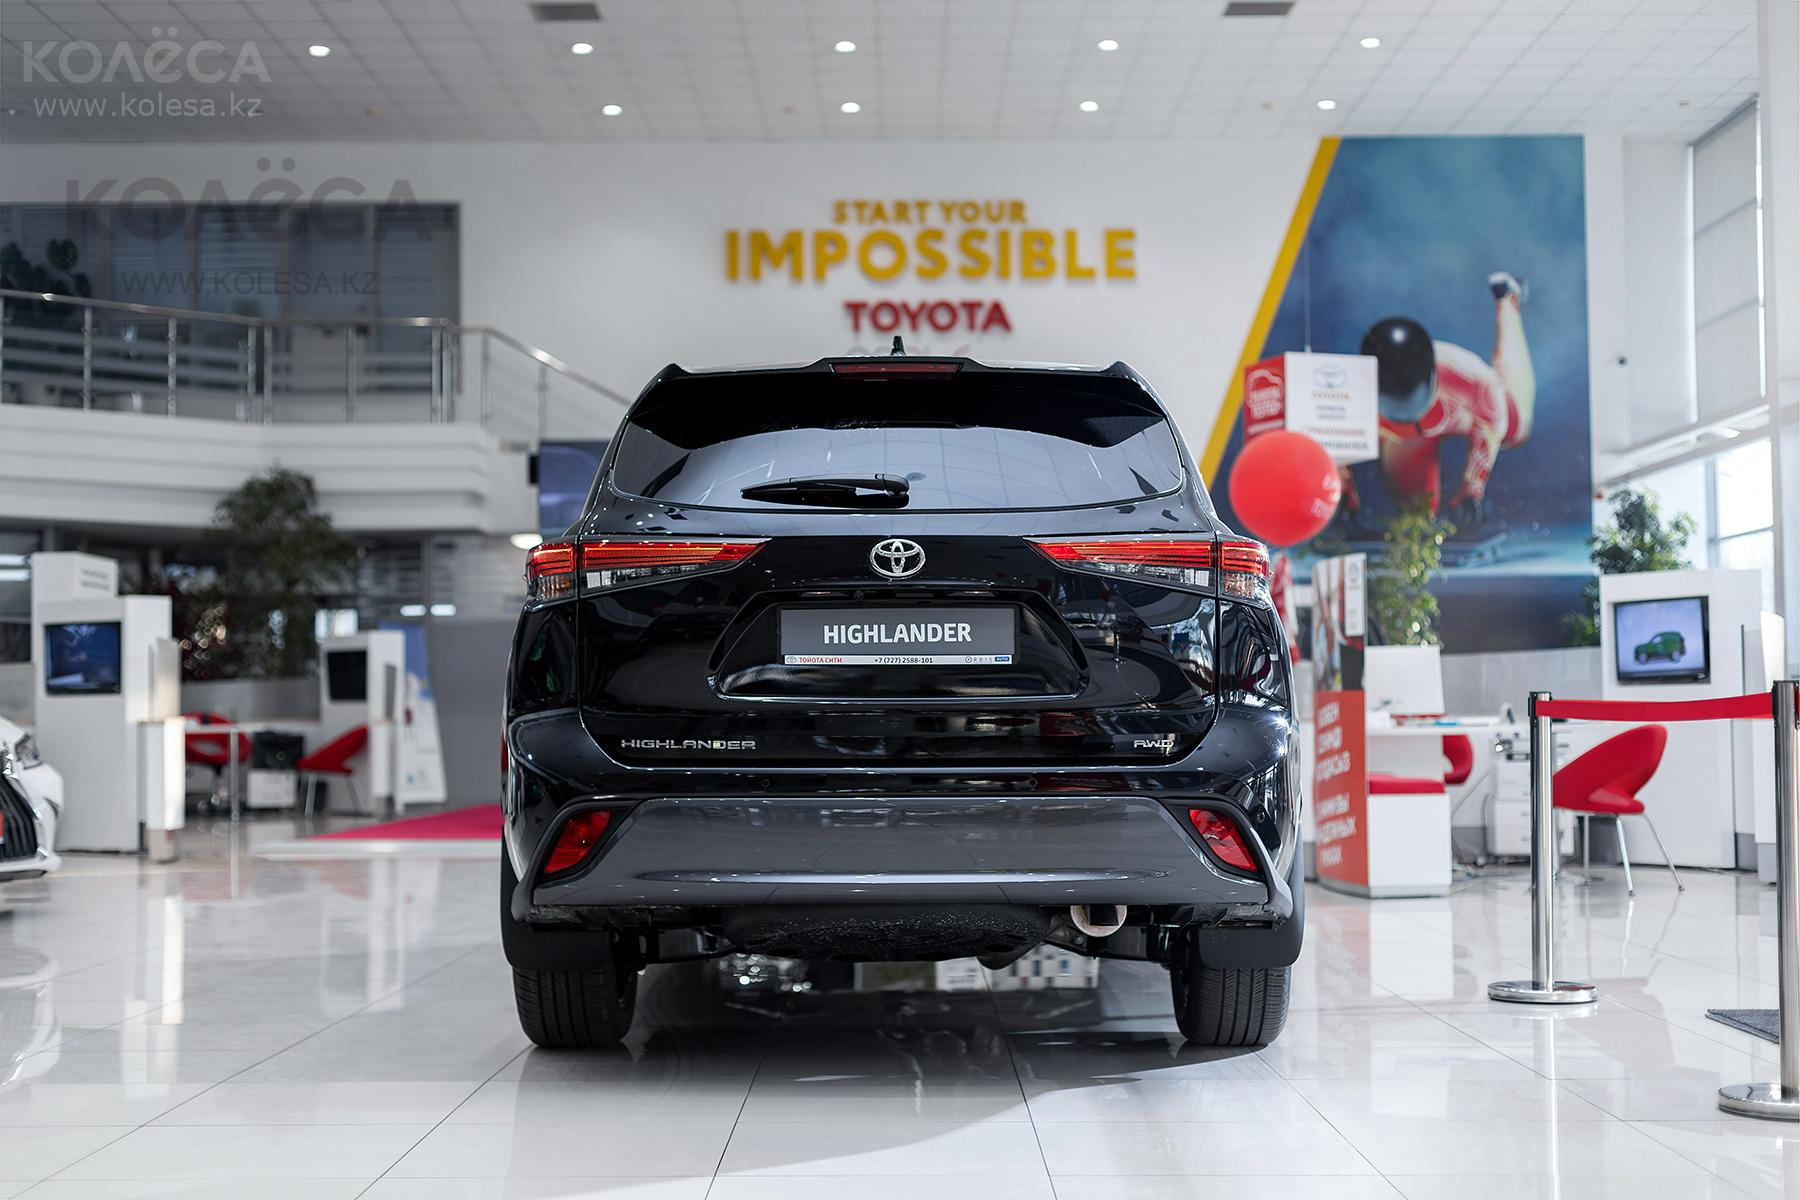 Toyota Highlander J класса 2020-2021 года от 29 490 000 тенге